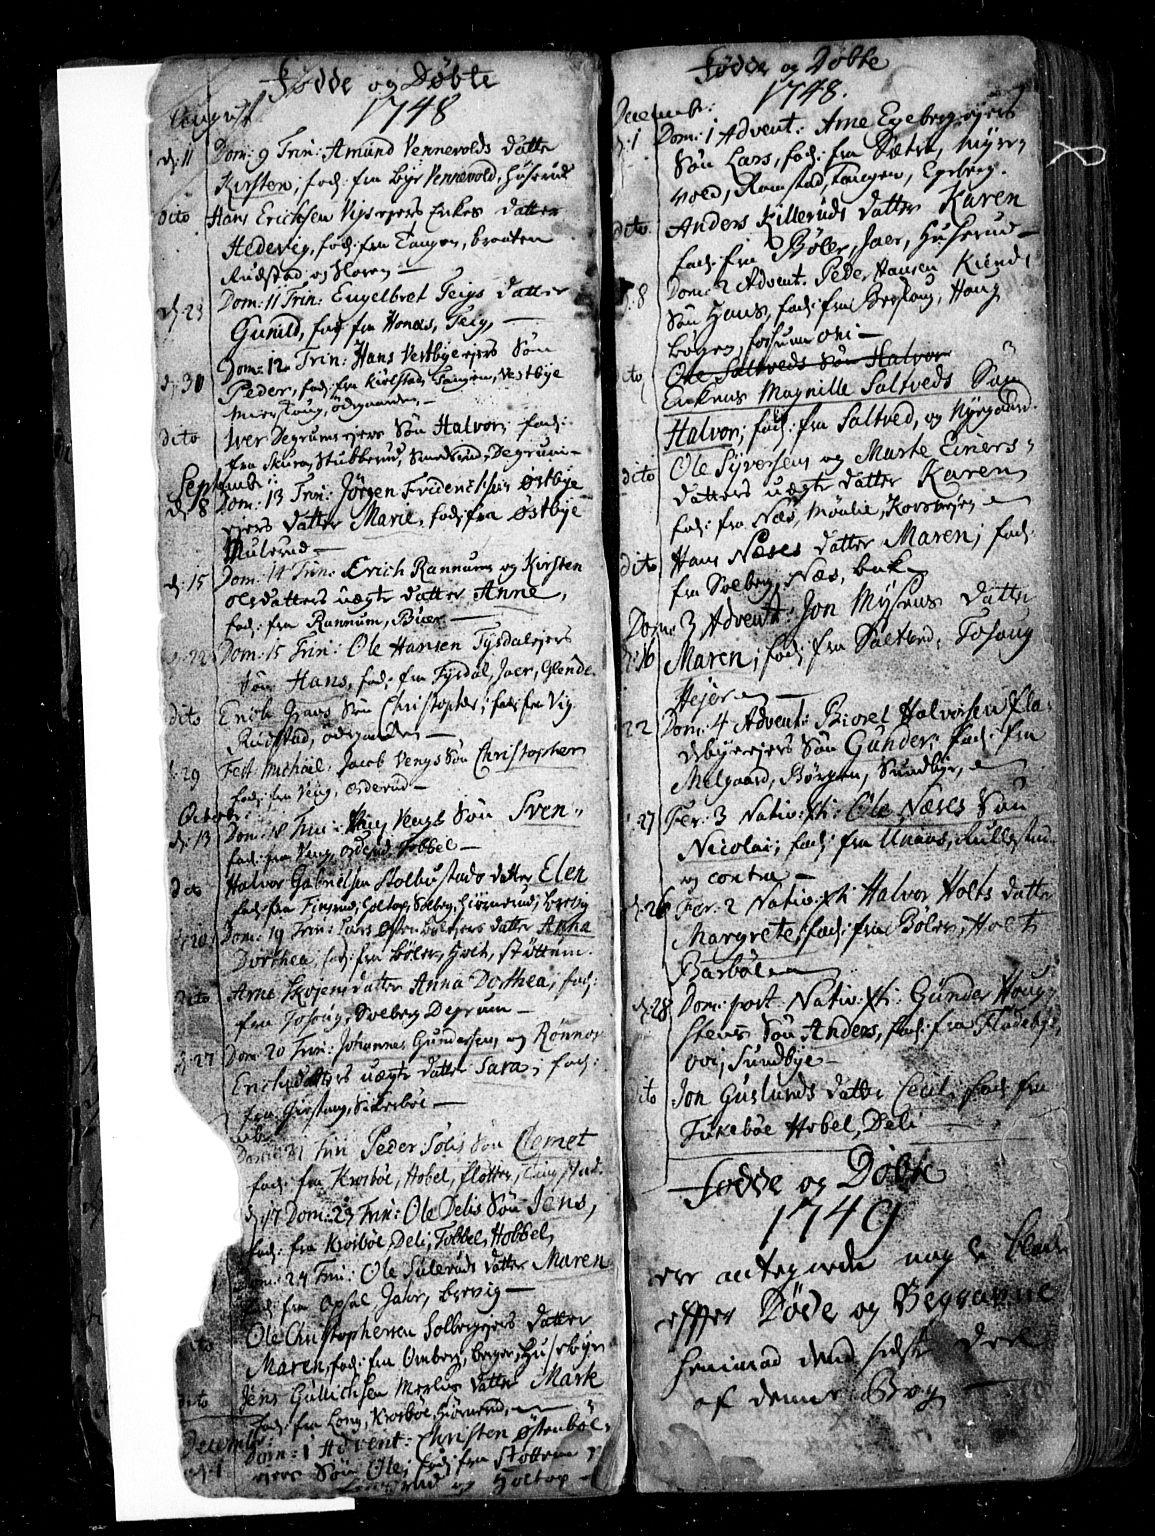 SAO, Enebakk prestekontor Kirkebøker, F/Fa/L0001: Ministerialbok nr. I 1, 1719-1754